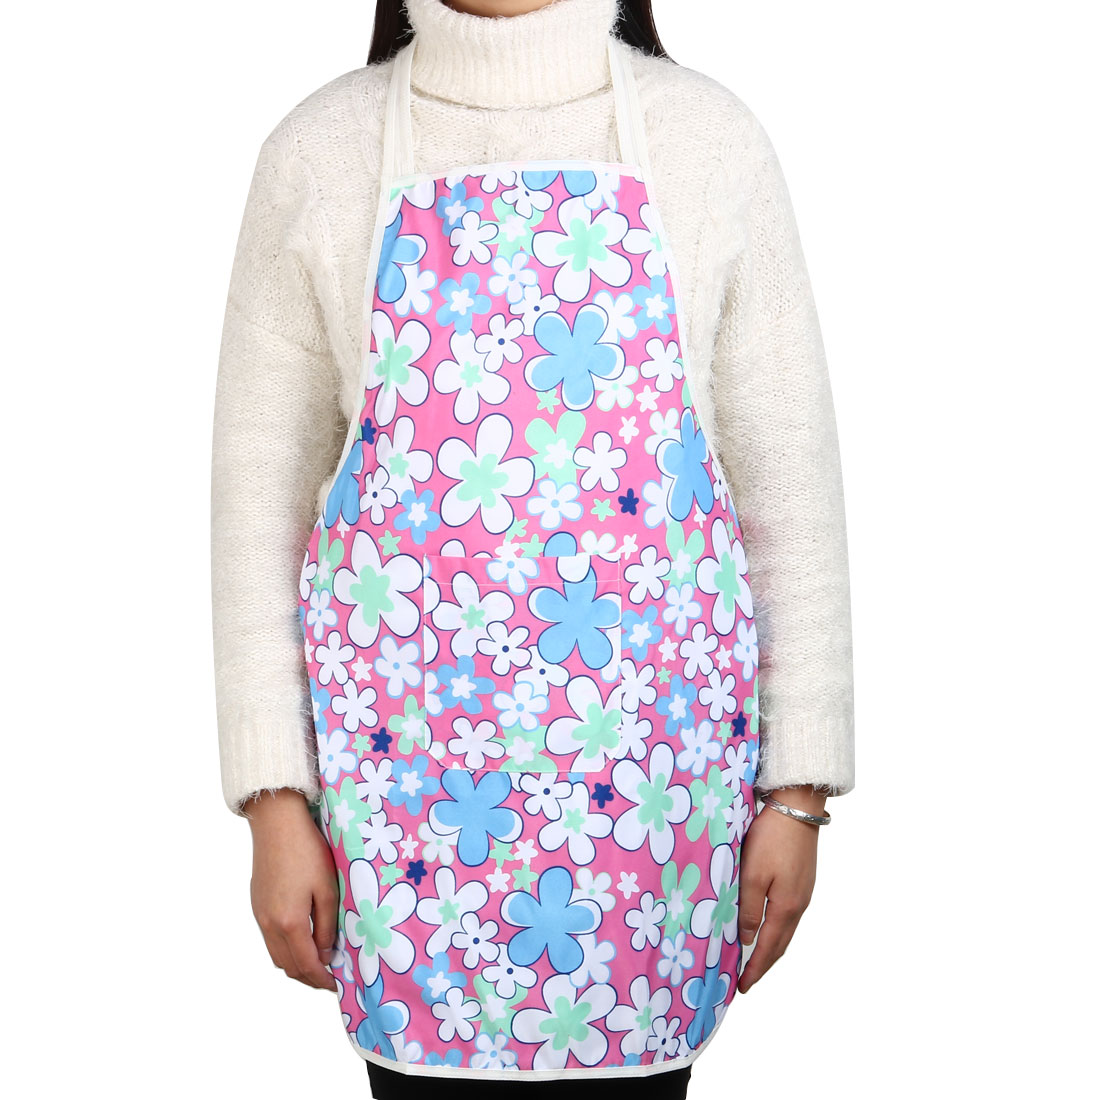 Household Kitchen Polyester Flower Pattern Anti-wear Cooking Baking Apron